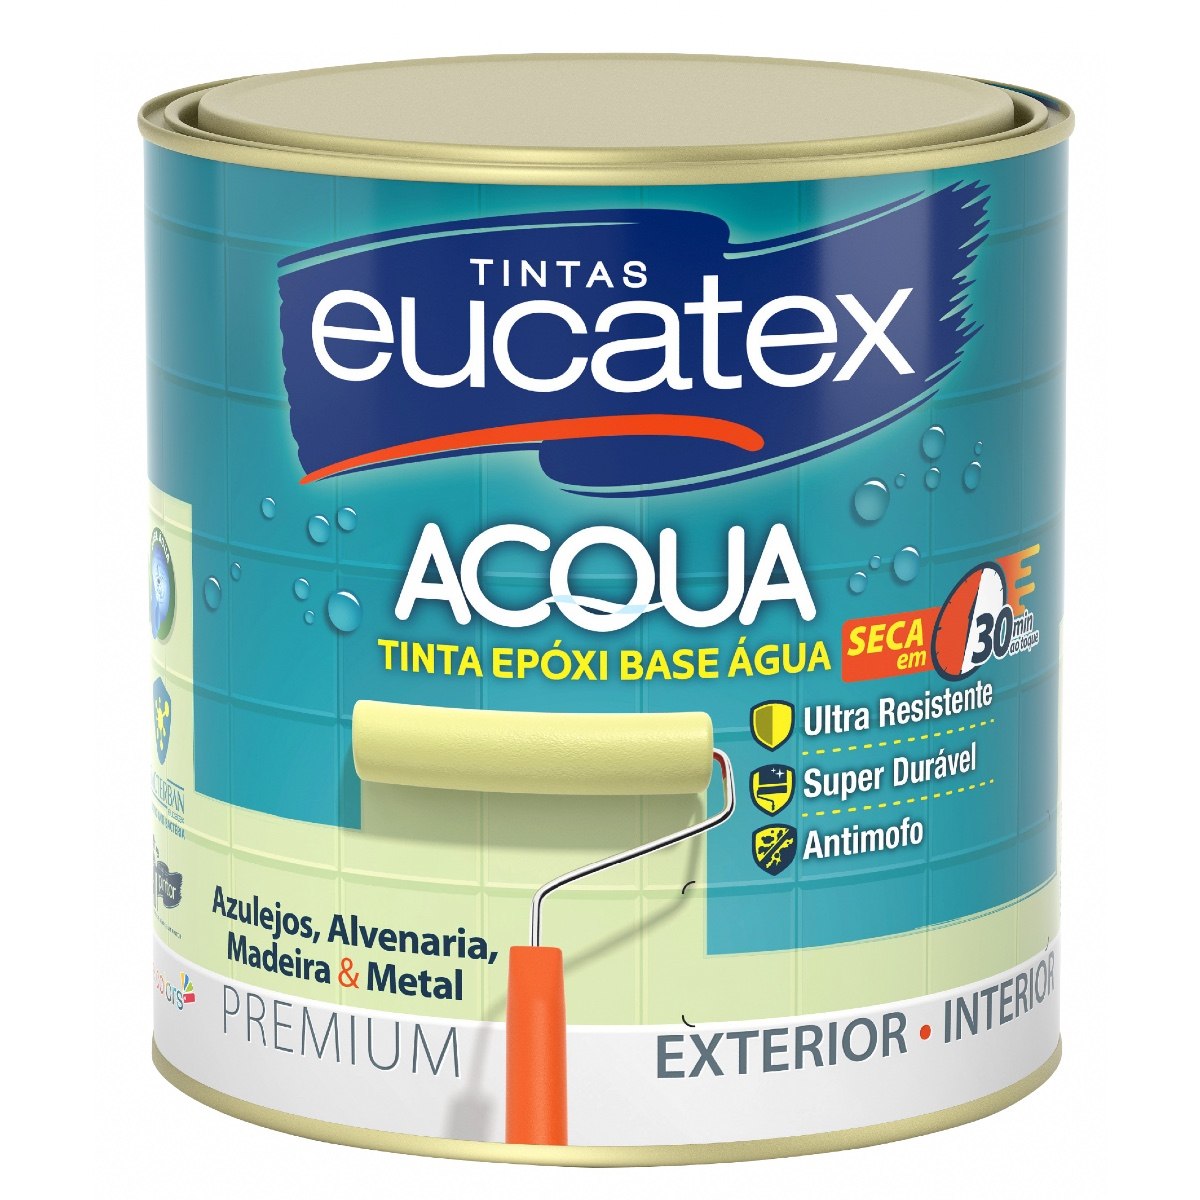 Tinta Epóxi Base Agua Eucatex Acqua Branco 900ml